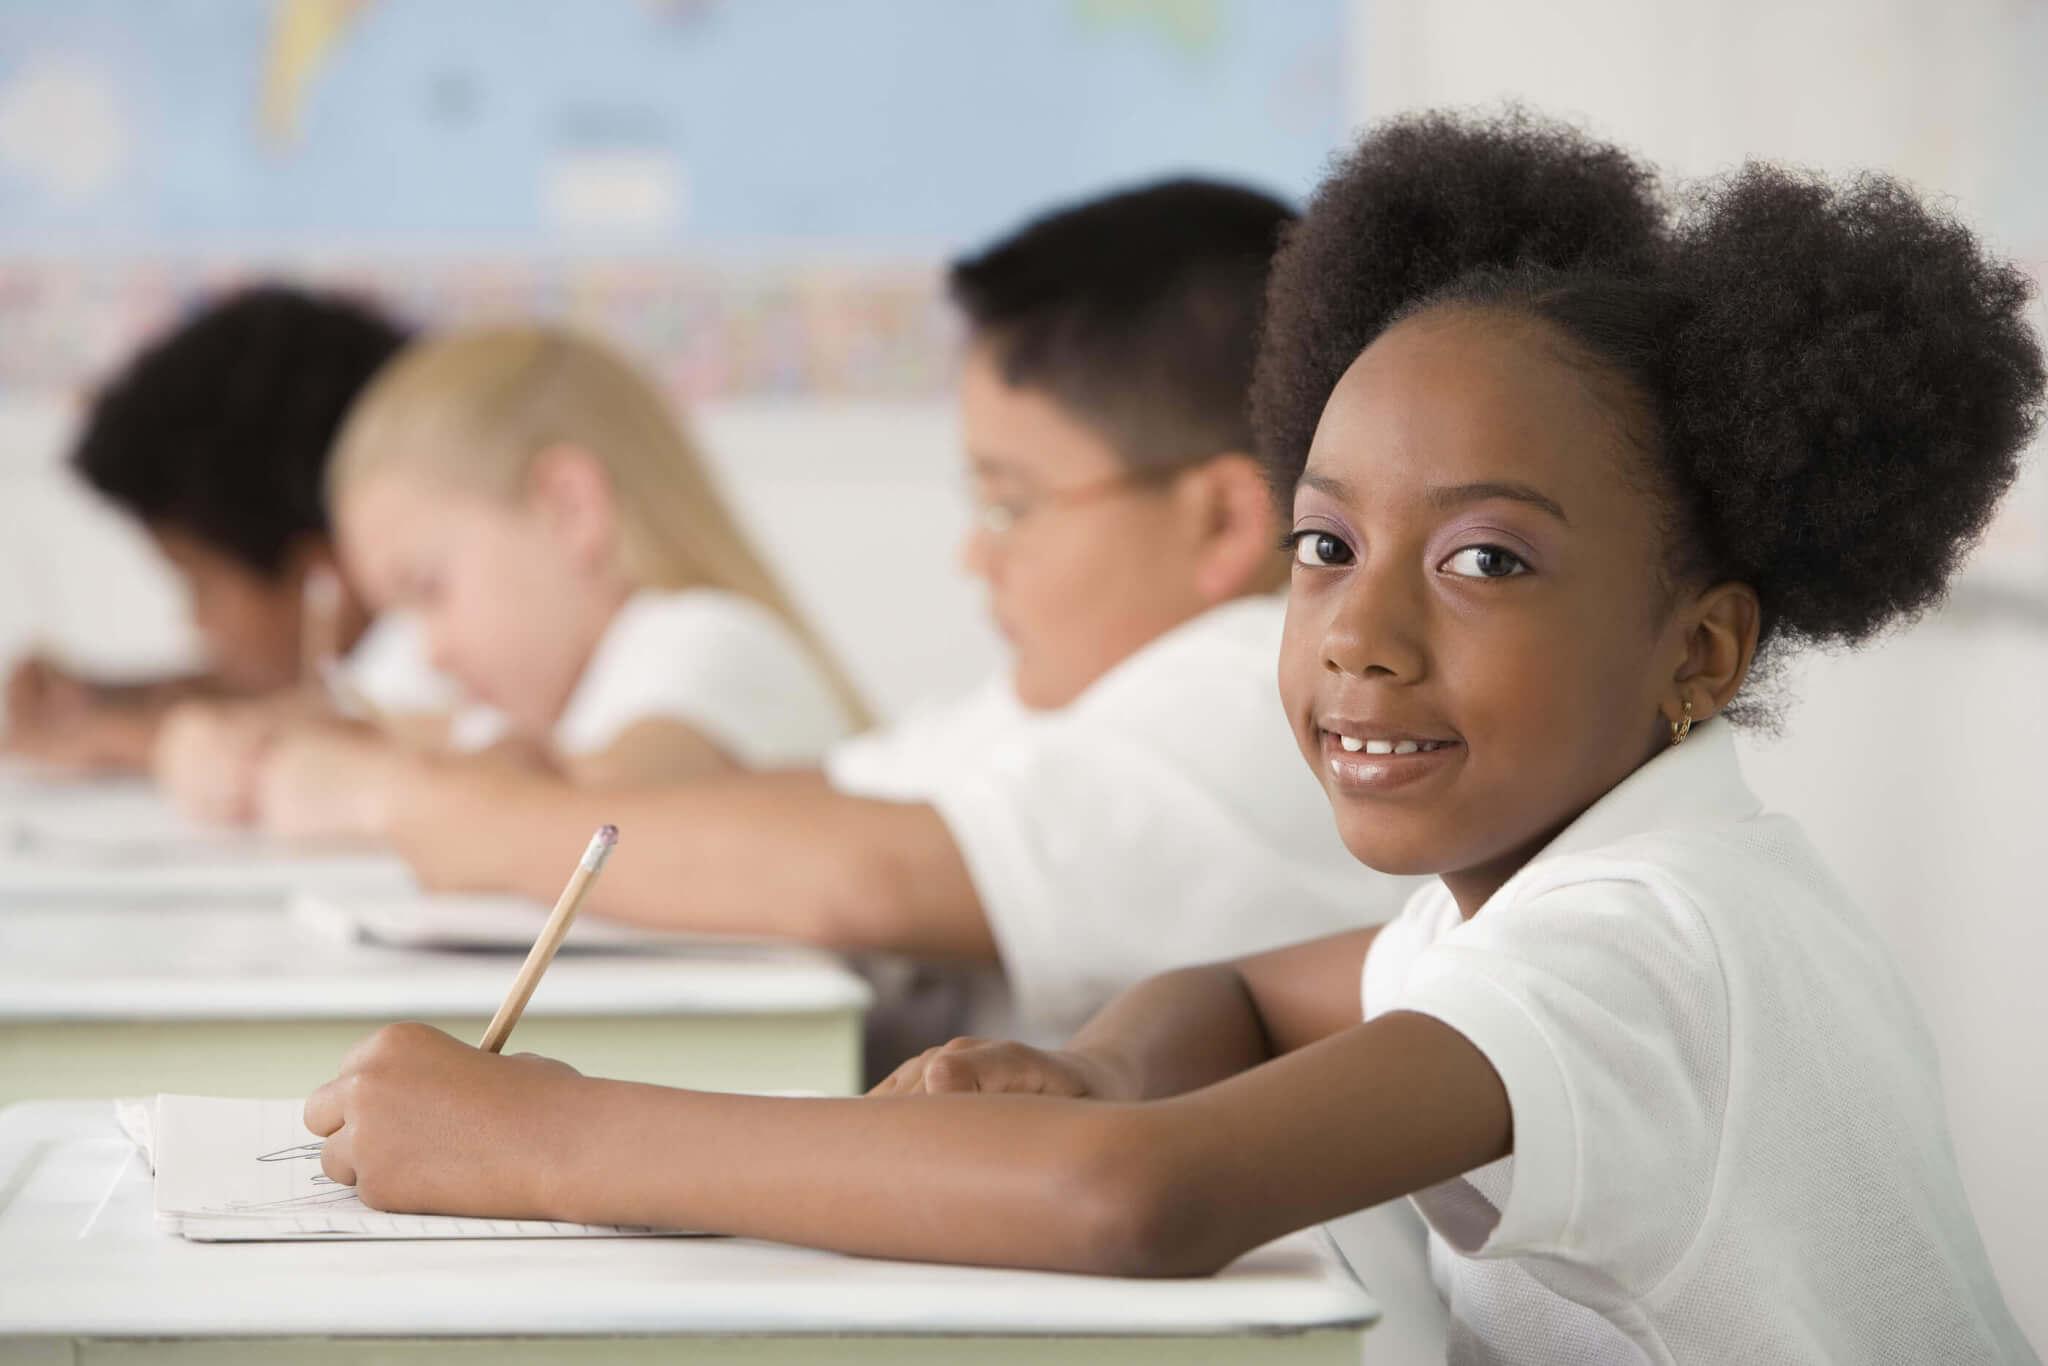 Multi-ethnic-children-writing-at-desks-in-classroom